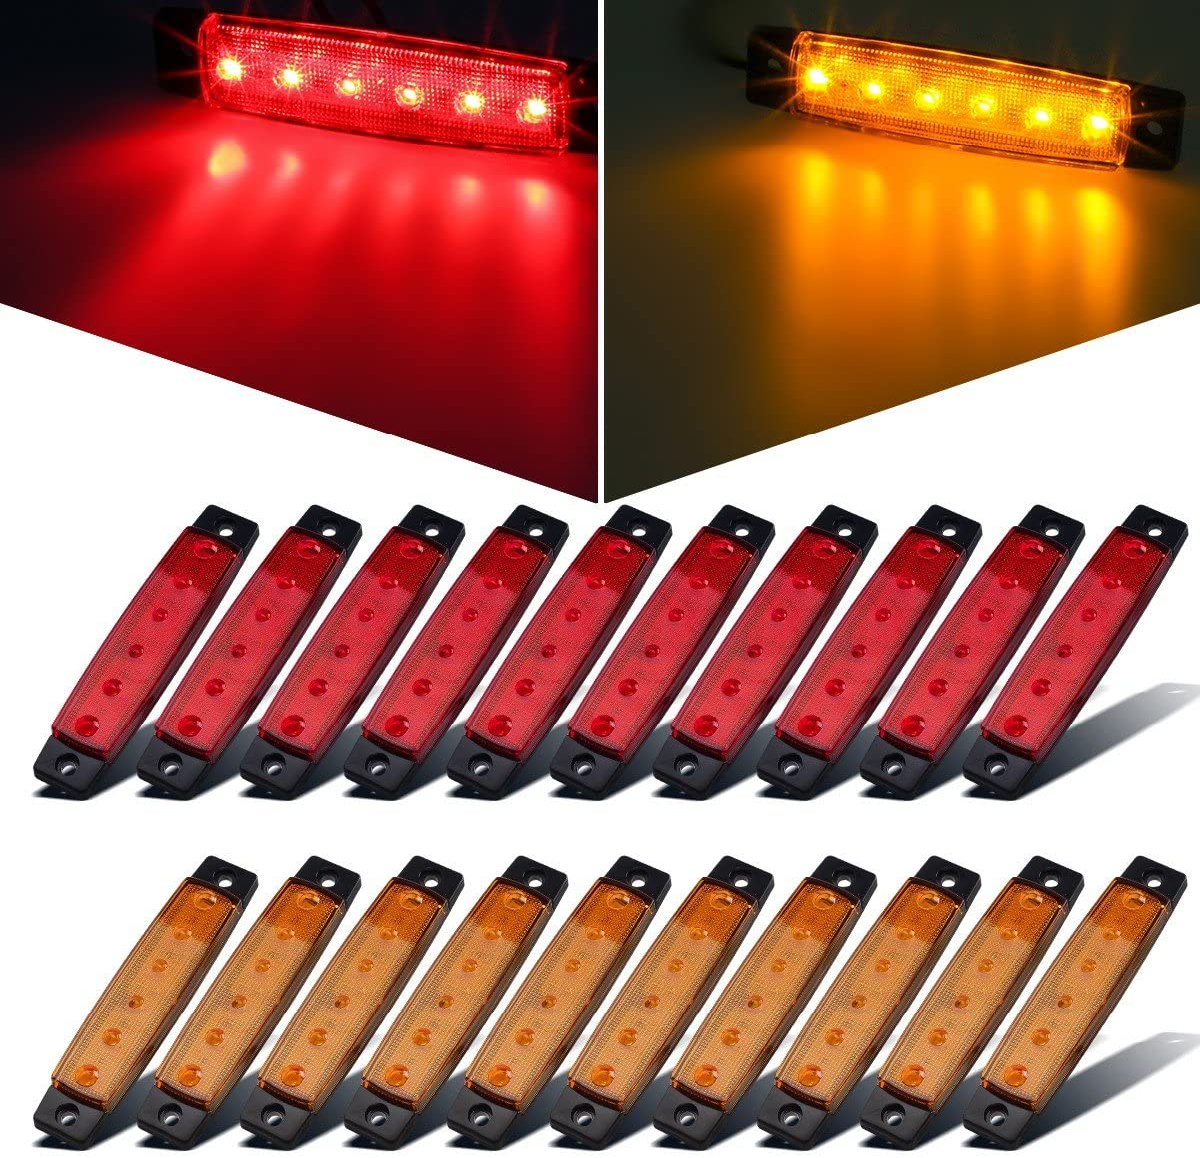 "Partsam 20x 3.8"" Amber/Red Clearance lights Truck Trailer RV Lorry Van Side Marker Indicators Decorative, Thin Line 3.8"" 6 LED Amber Trailer Marker Lights Parking Turn Signal Lights 81Ahzfz2XEL"